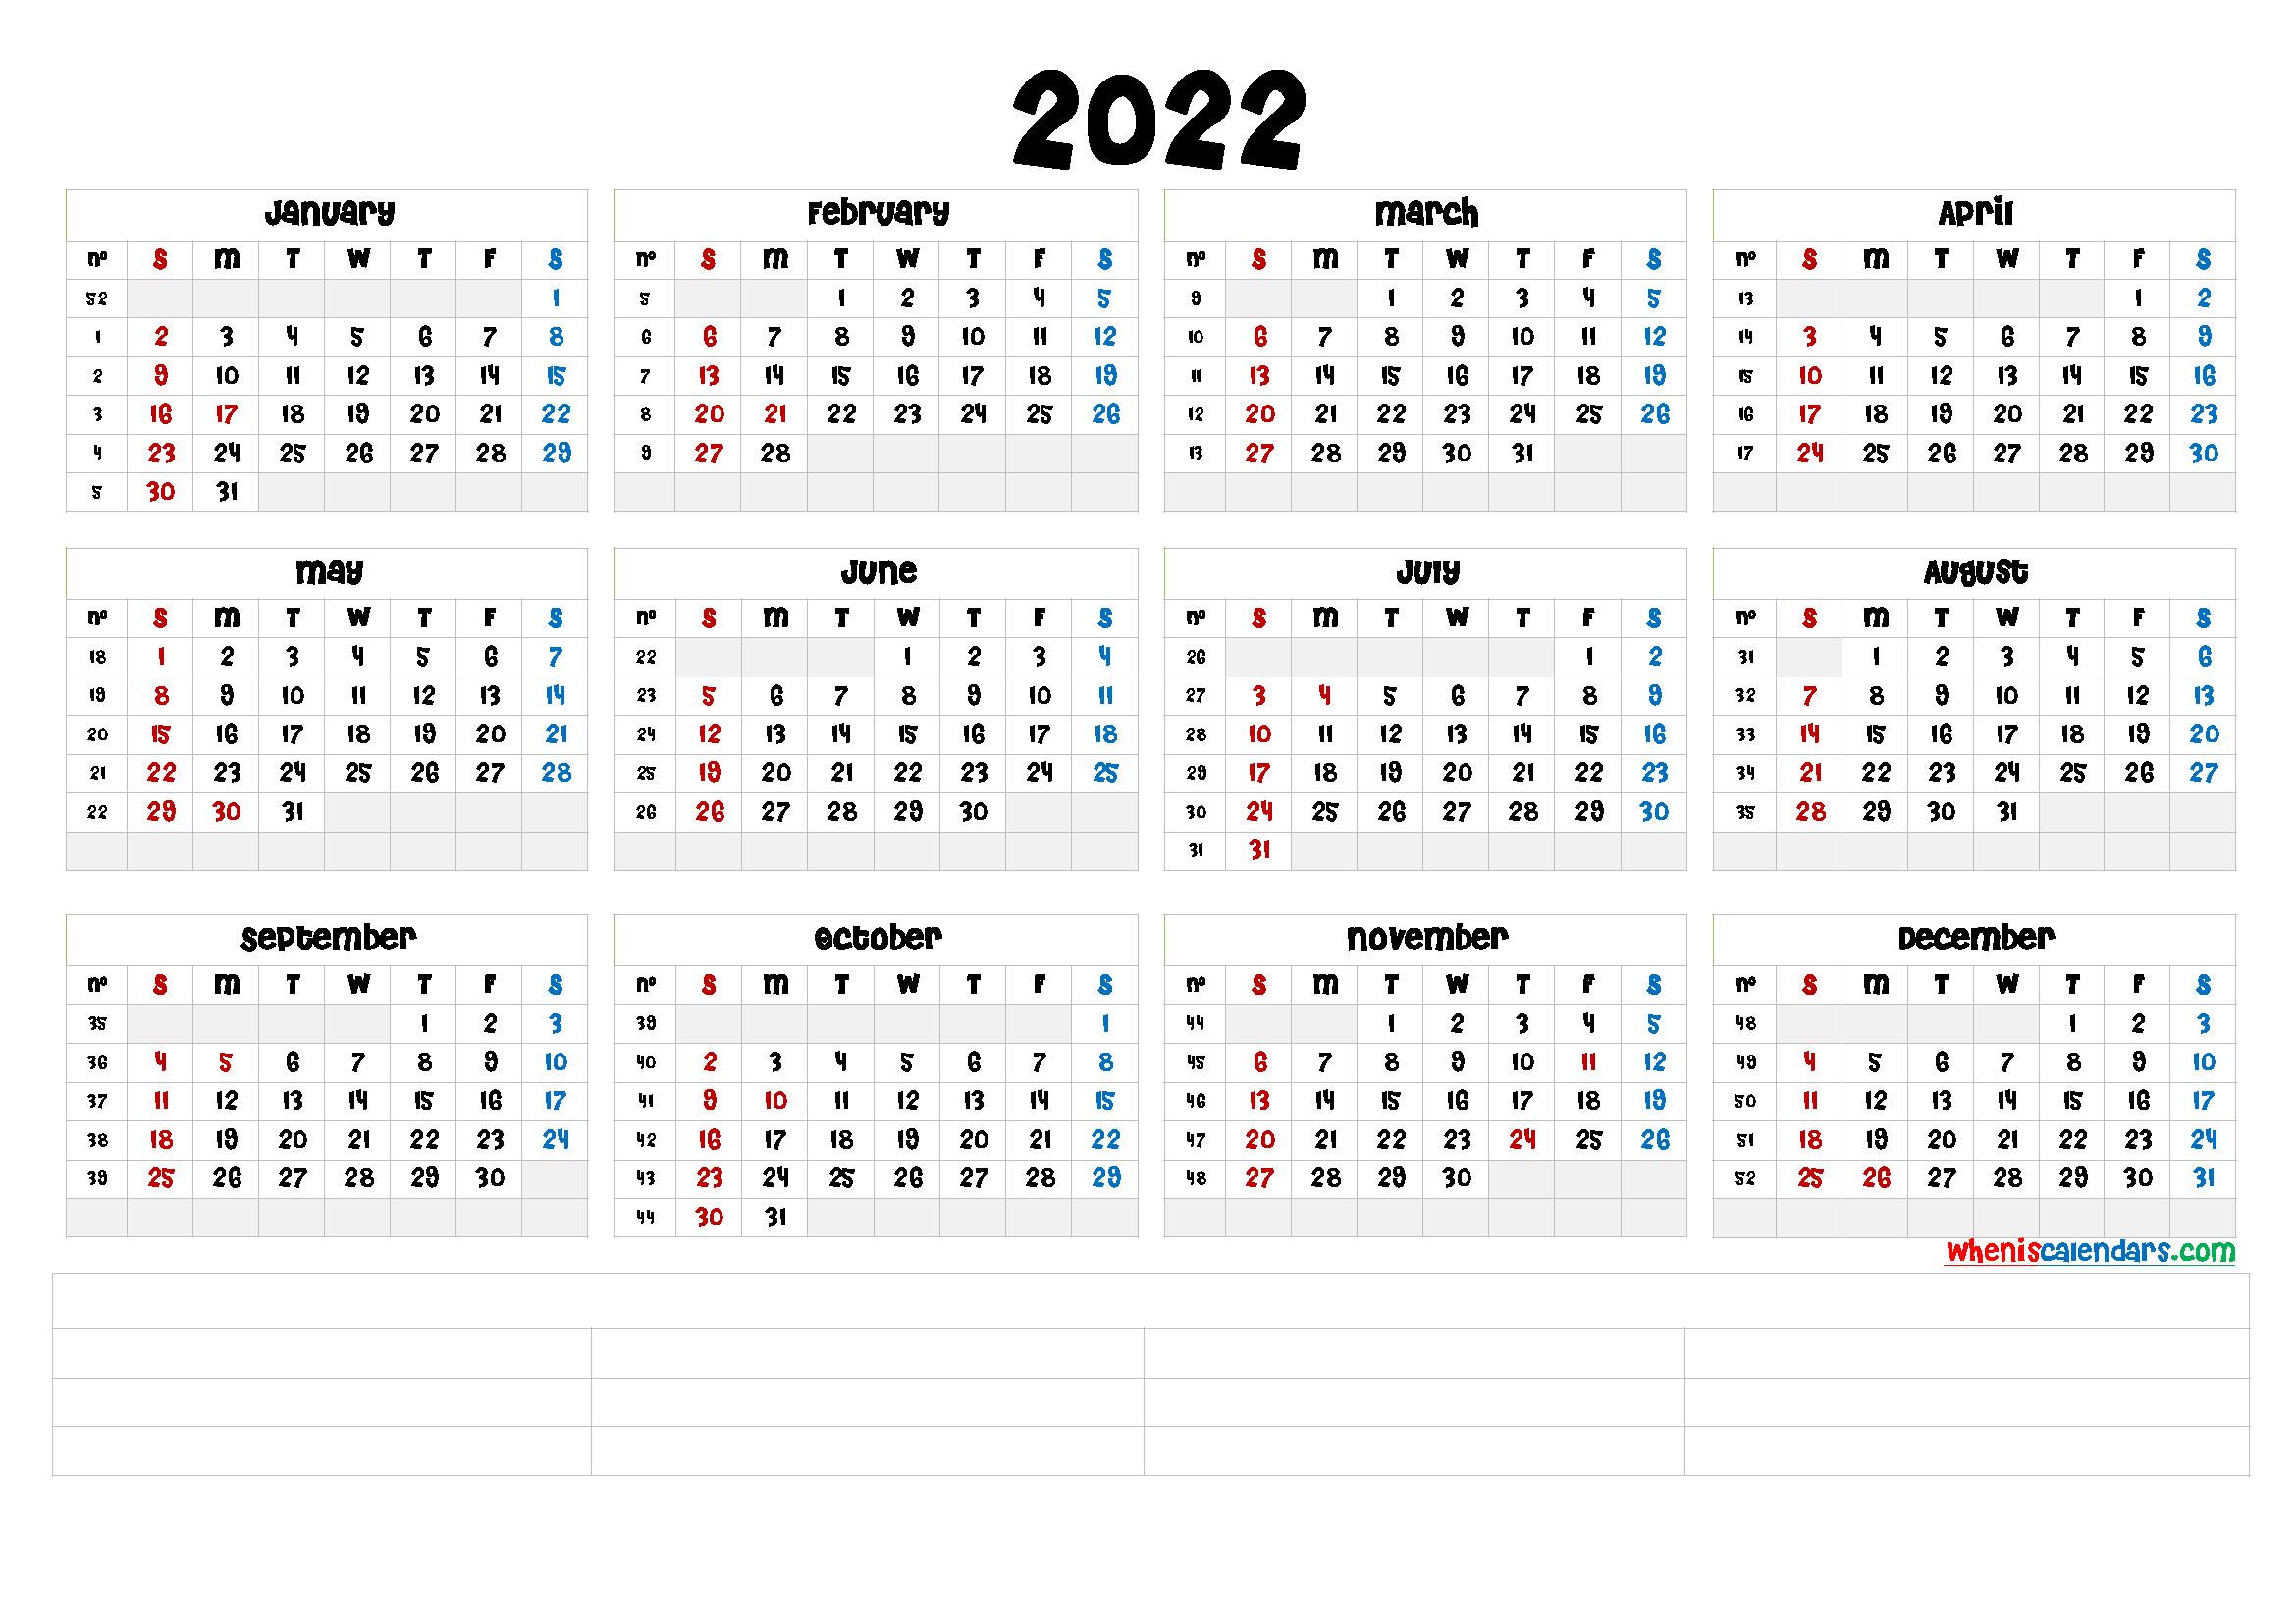 Free Printable 2022 Calendarmonth (6 Templates) - Free